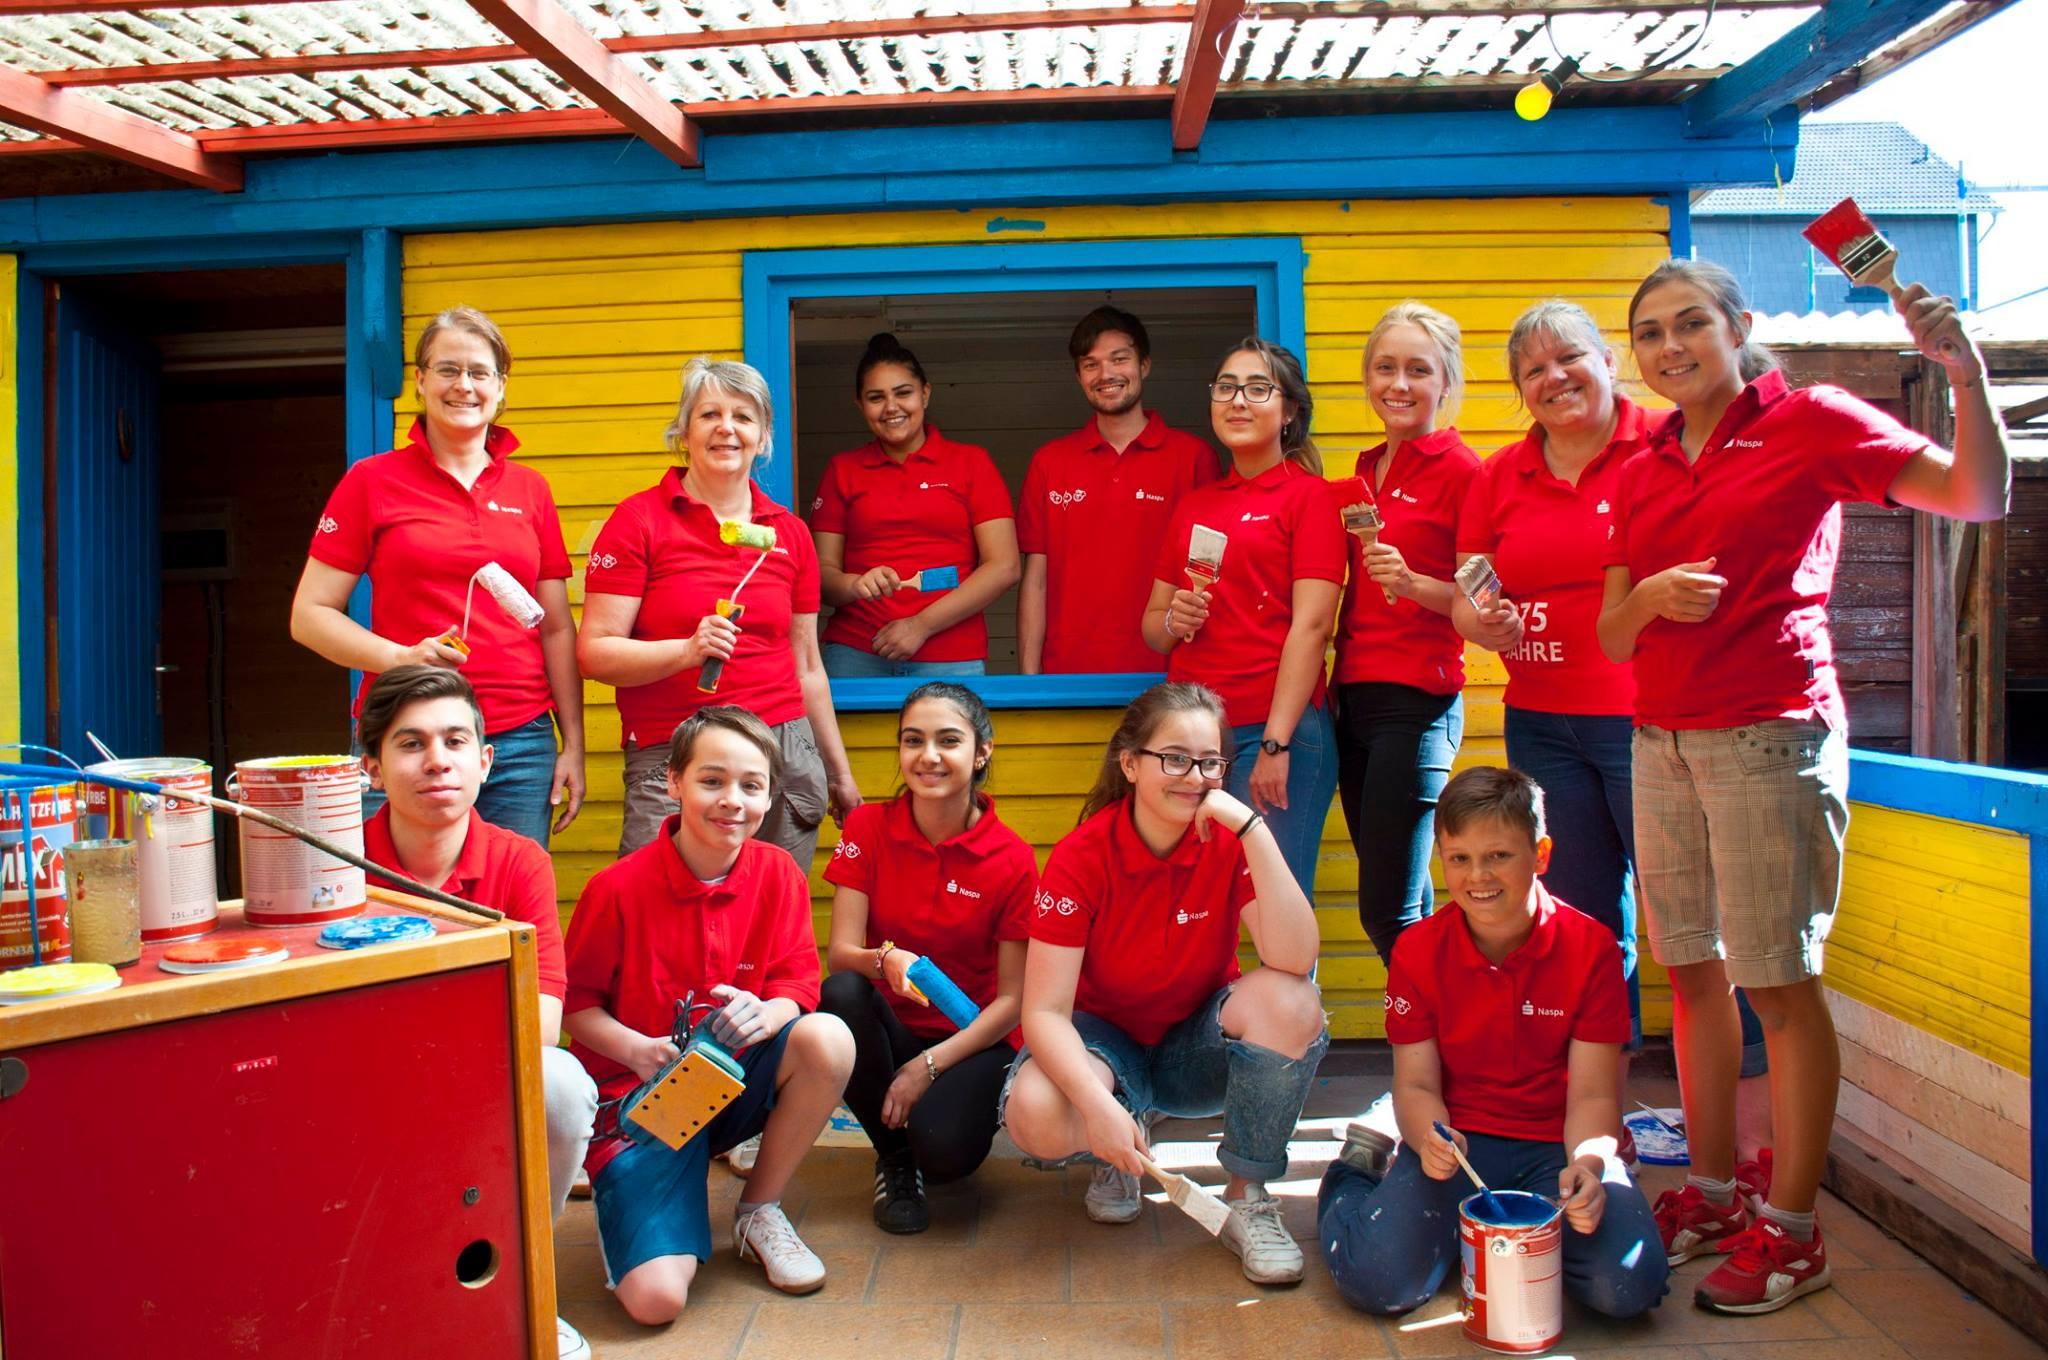 Engagement fördern, Profil stärken – Corporate Volunteering | DSGV - Bericht an die Gesellschaft